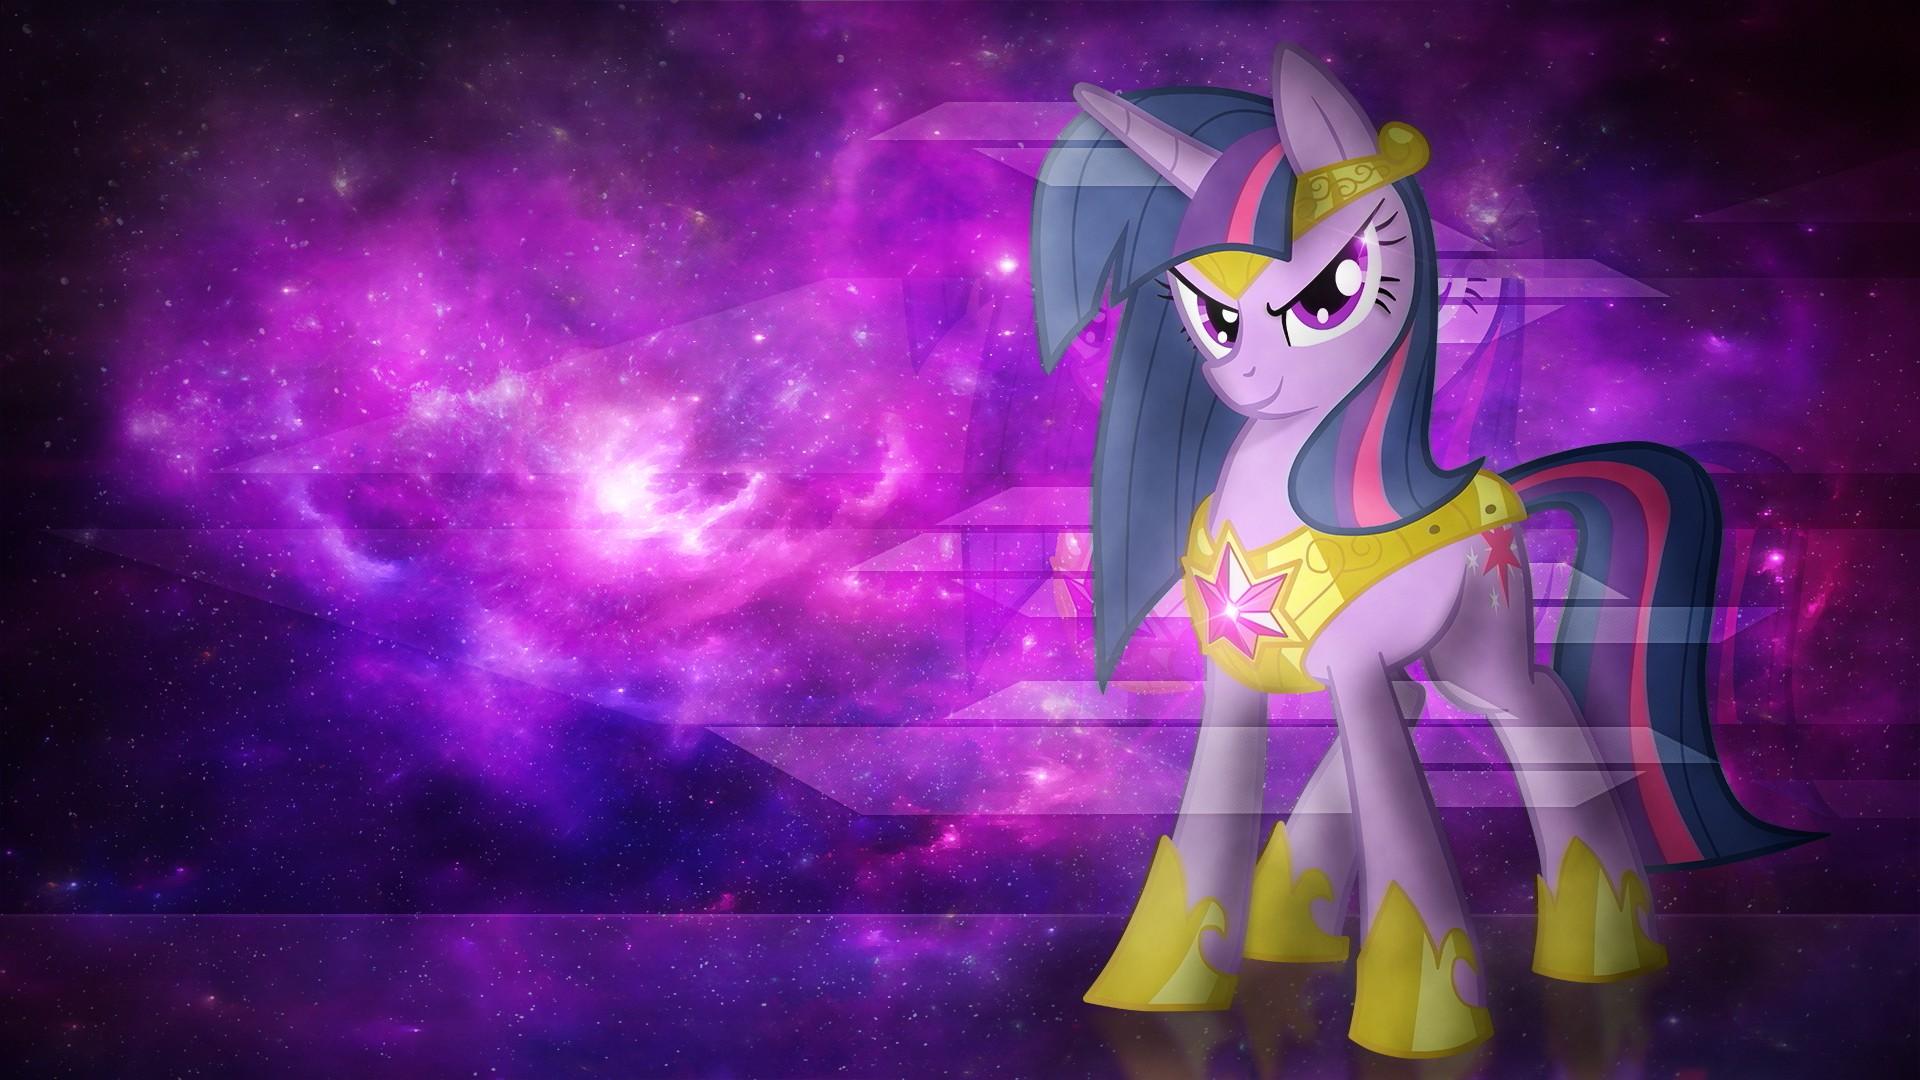 Rainbow Dash Wallpaper Hd Cartoons Ponies Twilight Sparkle My Little Pony